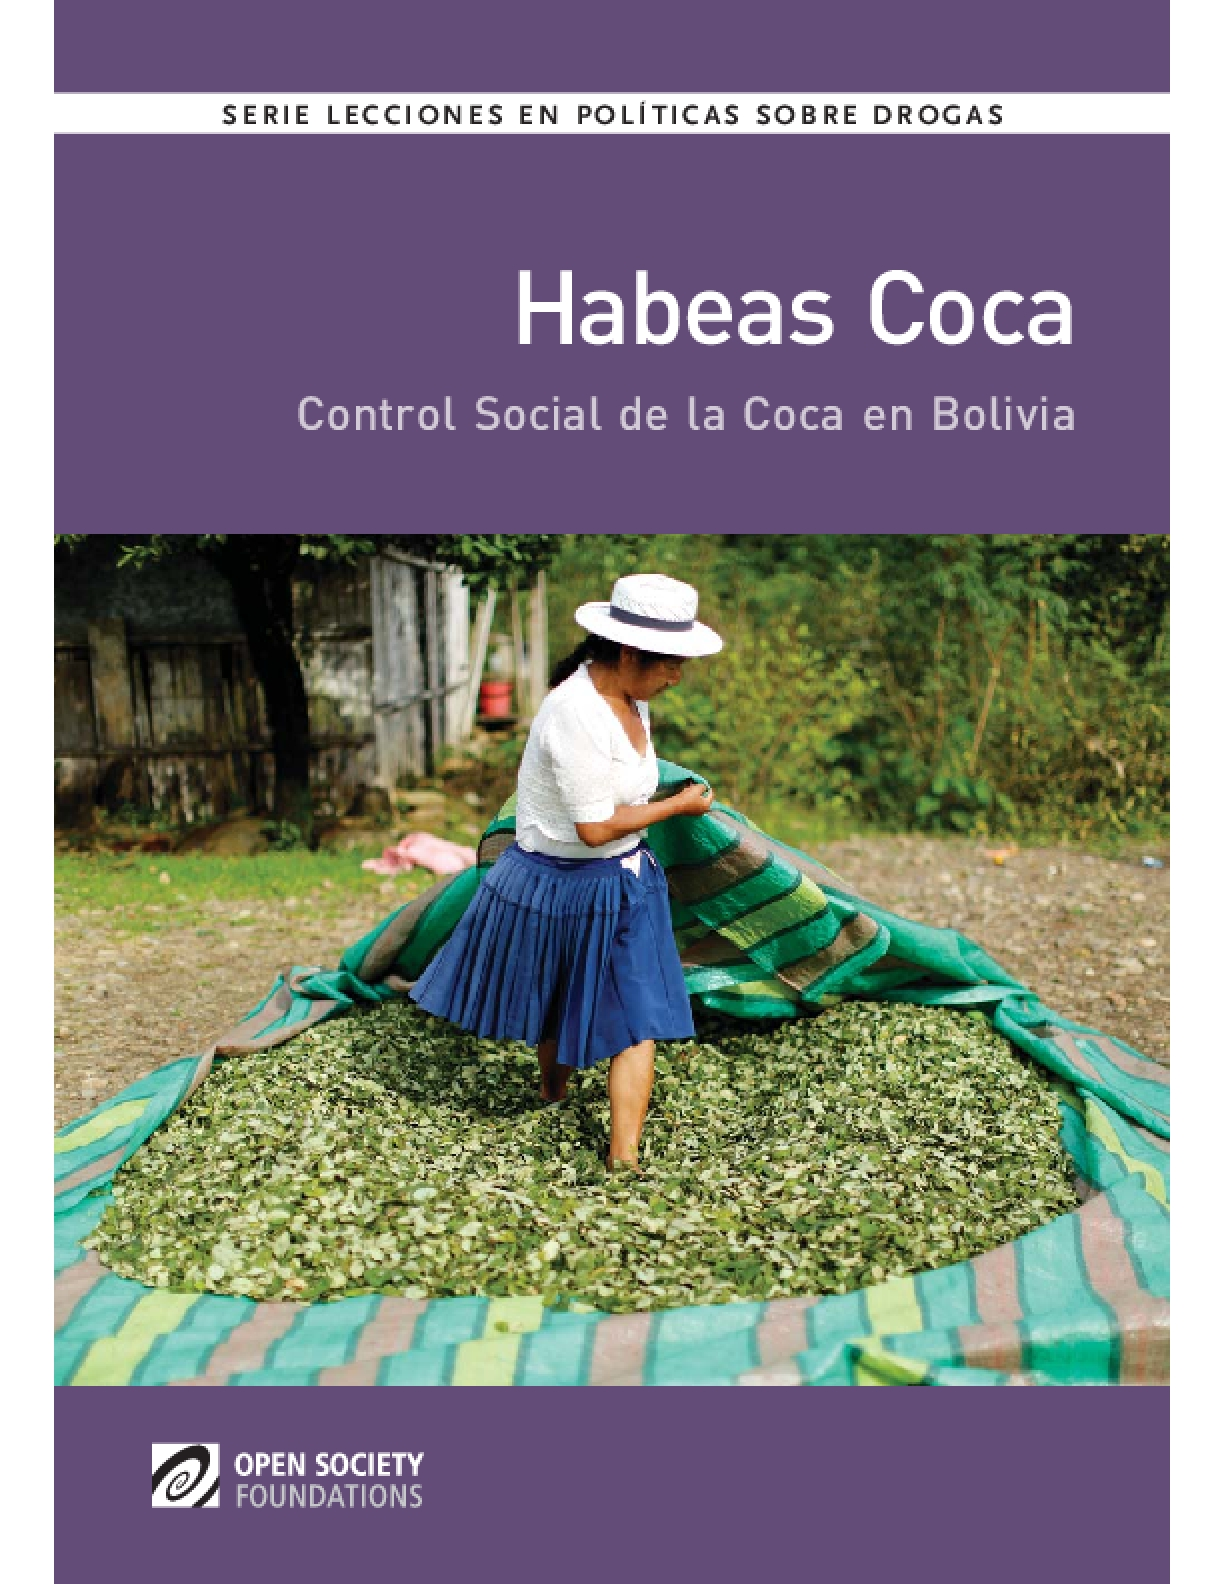 Habeas Coca: Bolivia's Community Coca Control: Spanish